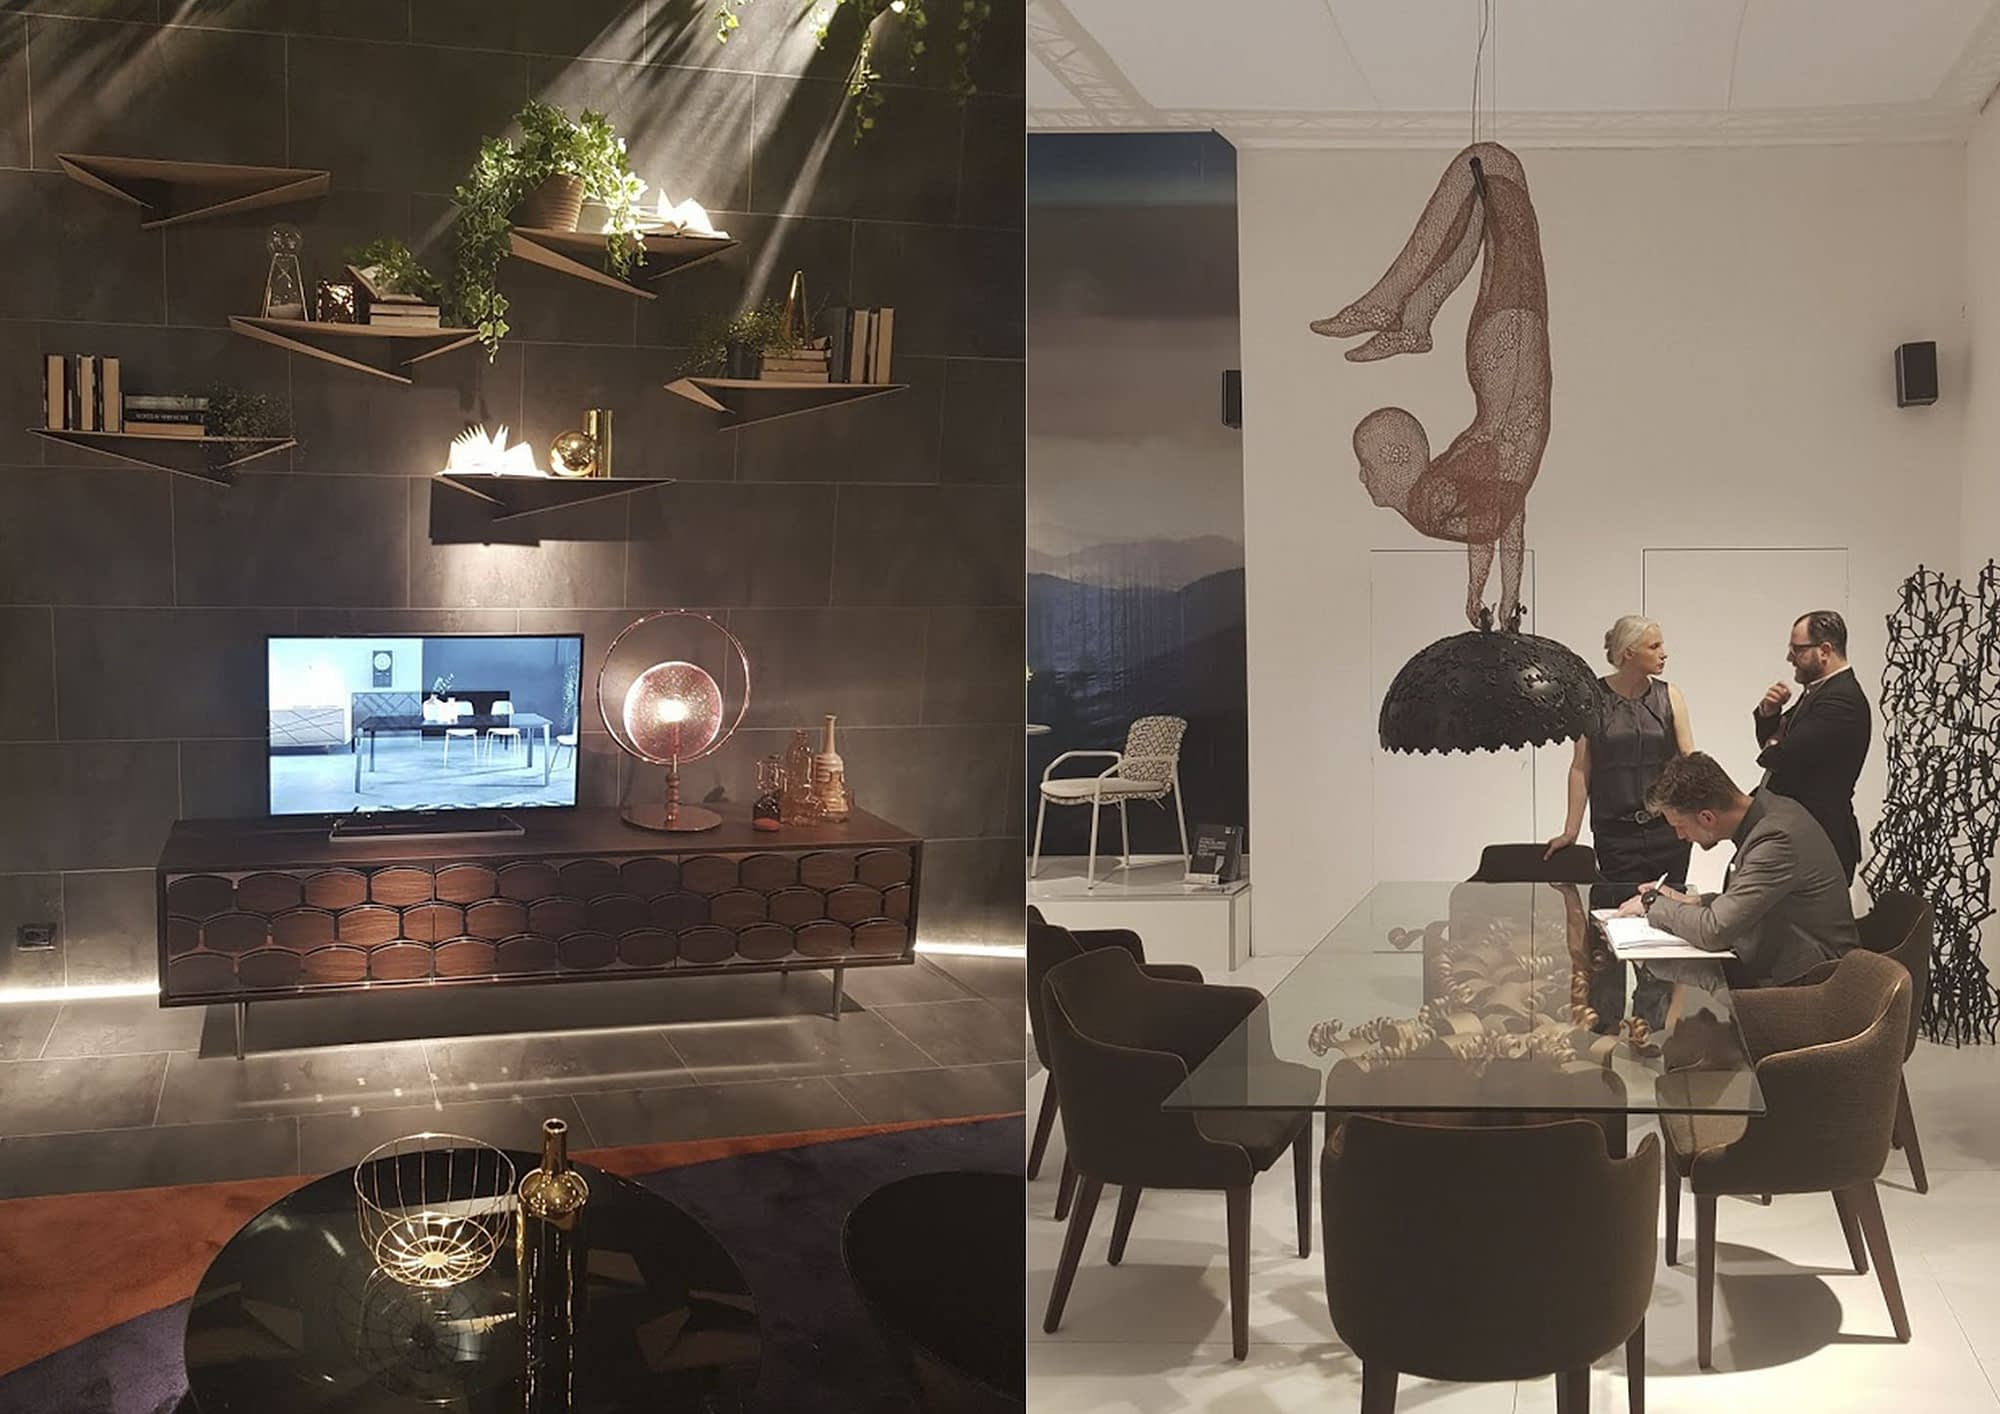 Milano Design Week 2018 - Salone del Mobile 90